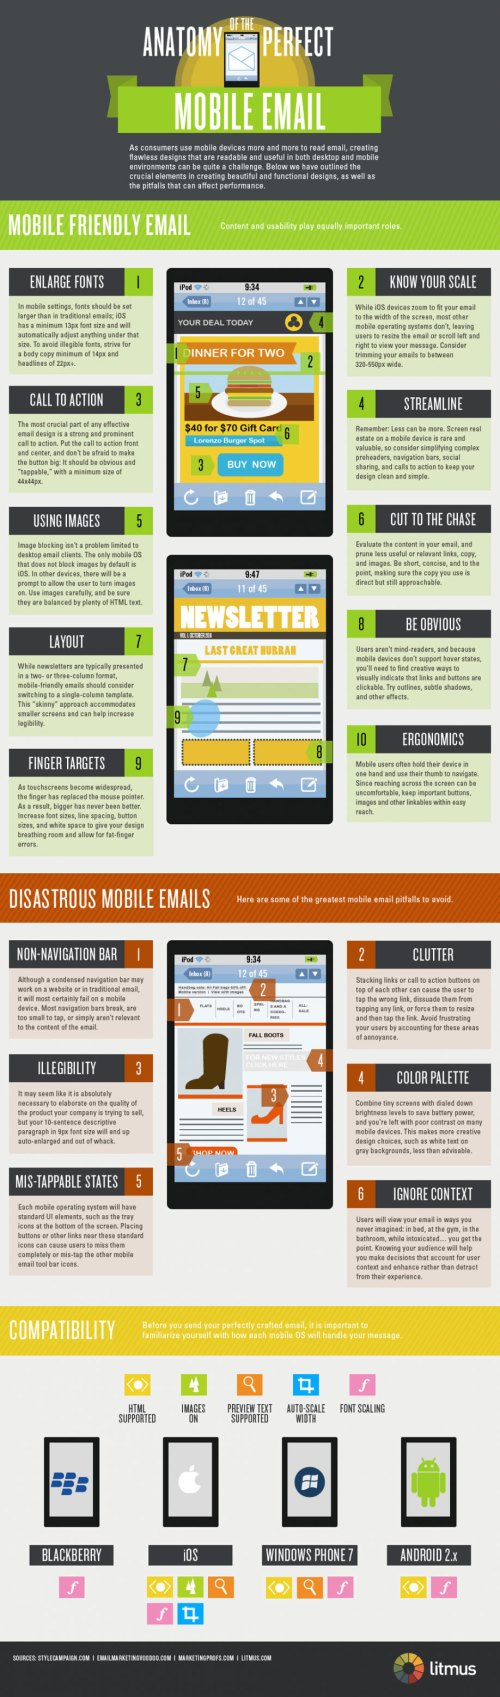 Litmus-anatomy-mobile-email-c5